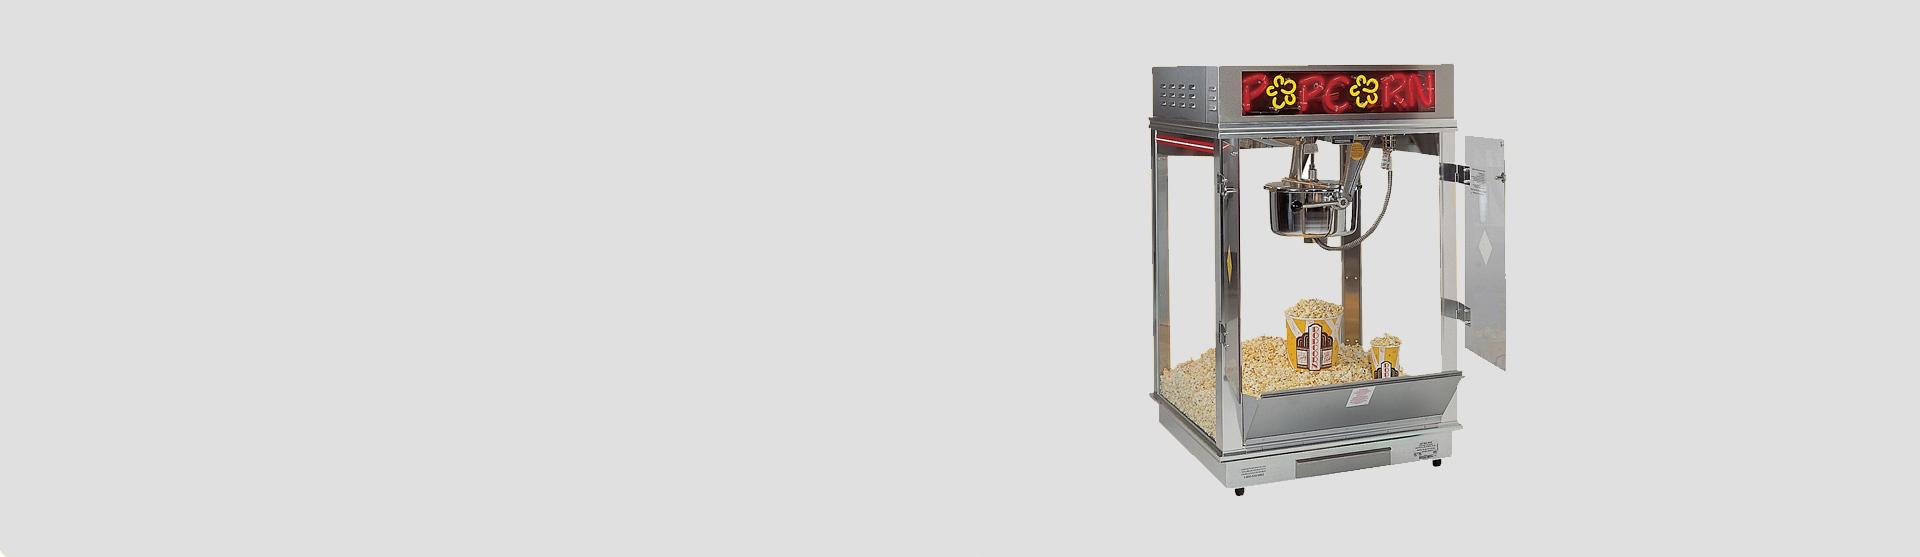 Popcorn-machines